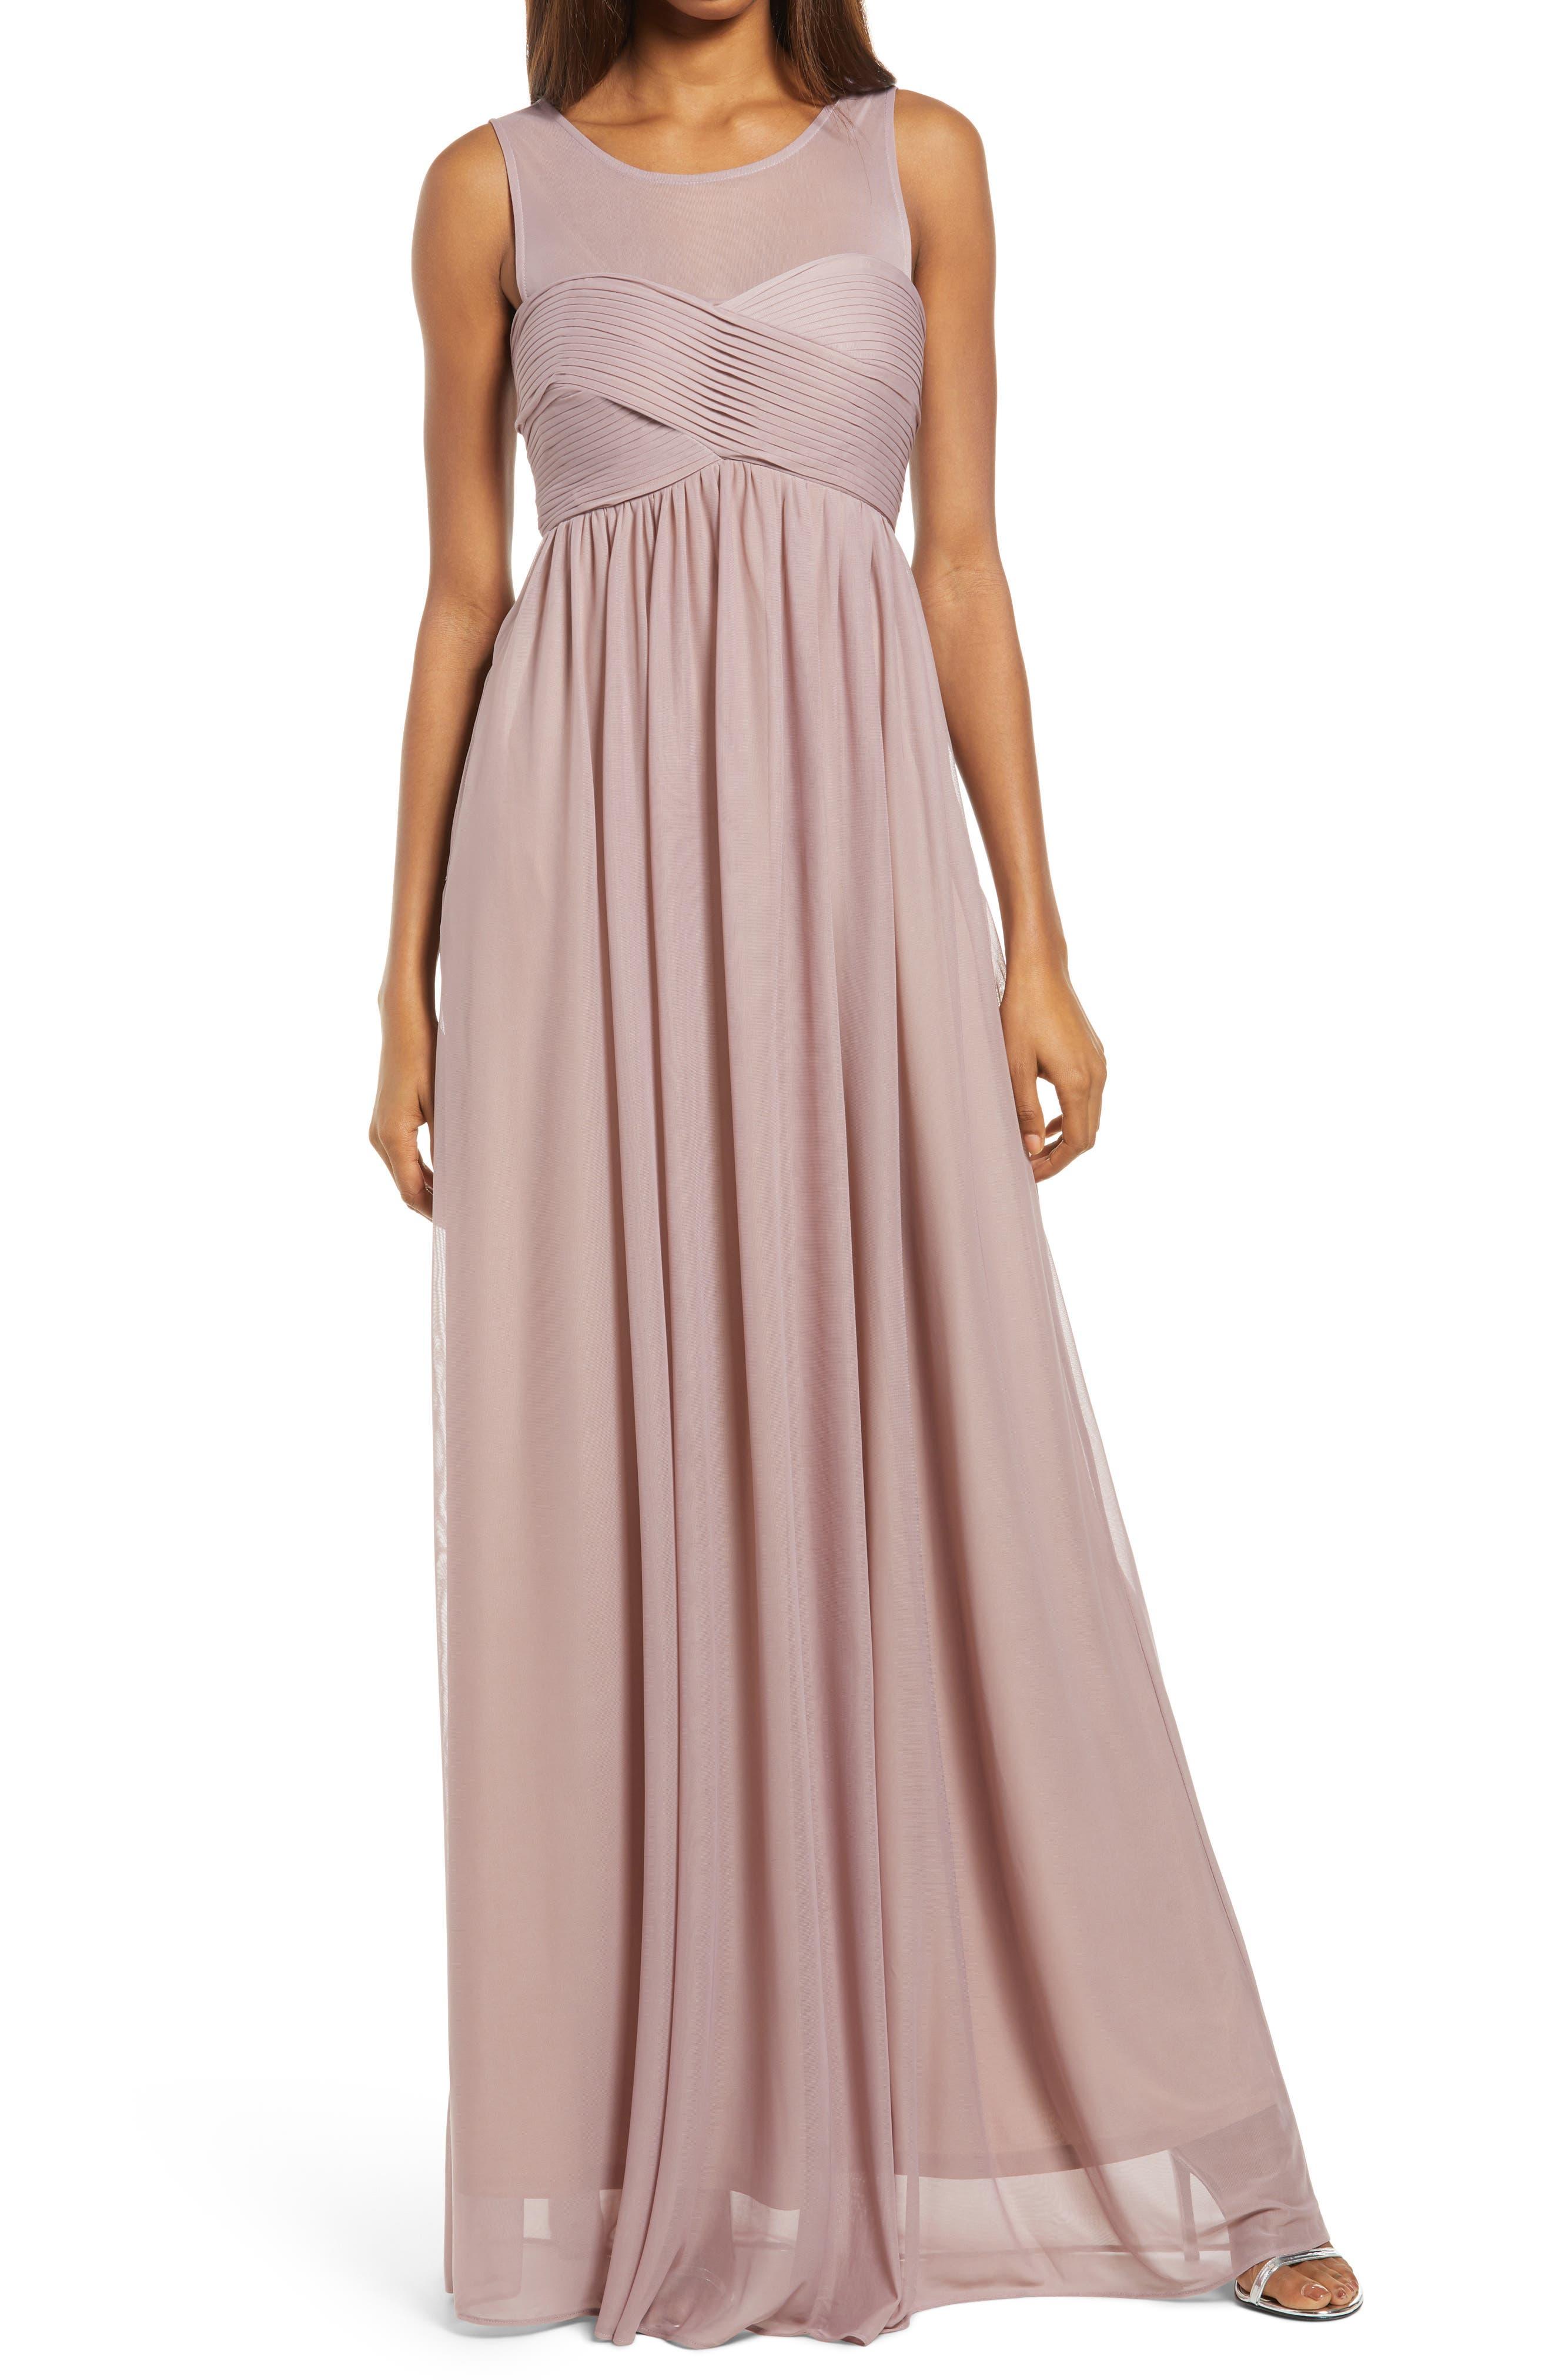 Ryan Sleeveless Empire Waist Gown